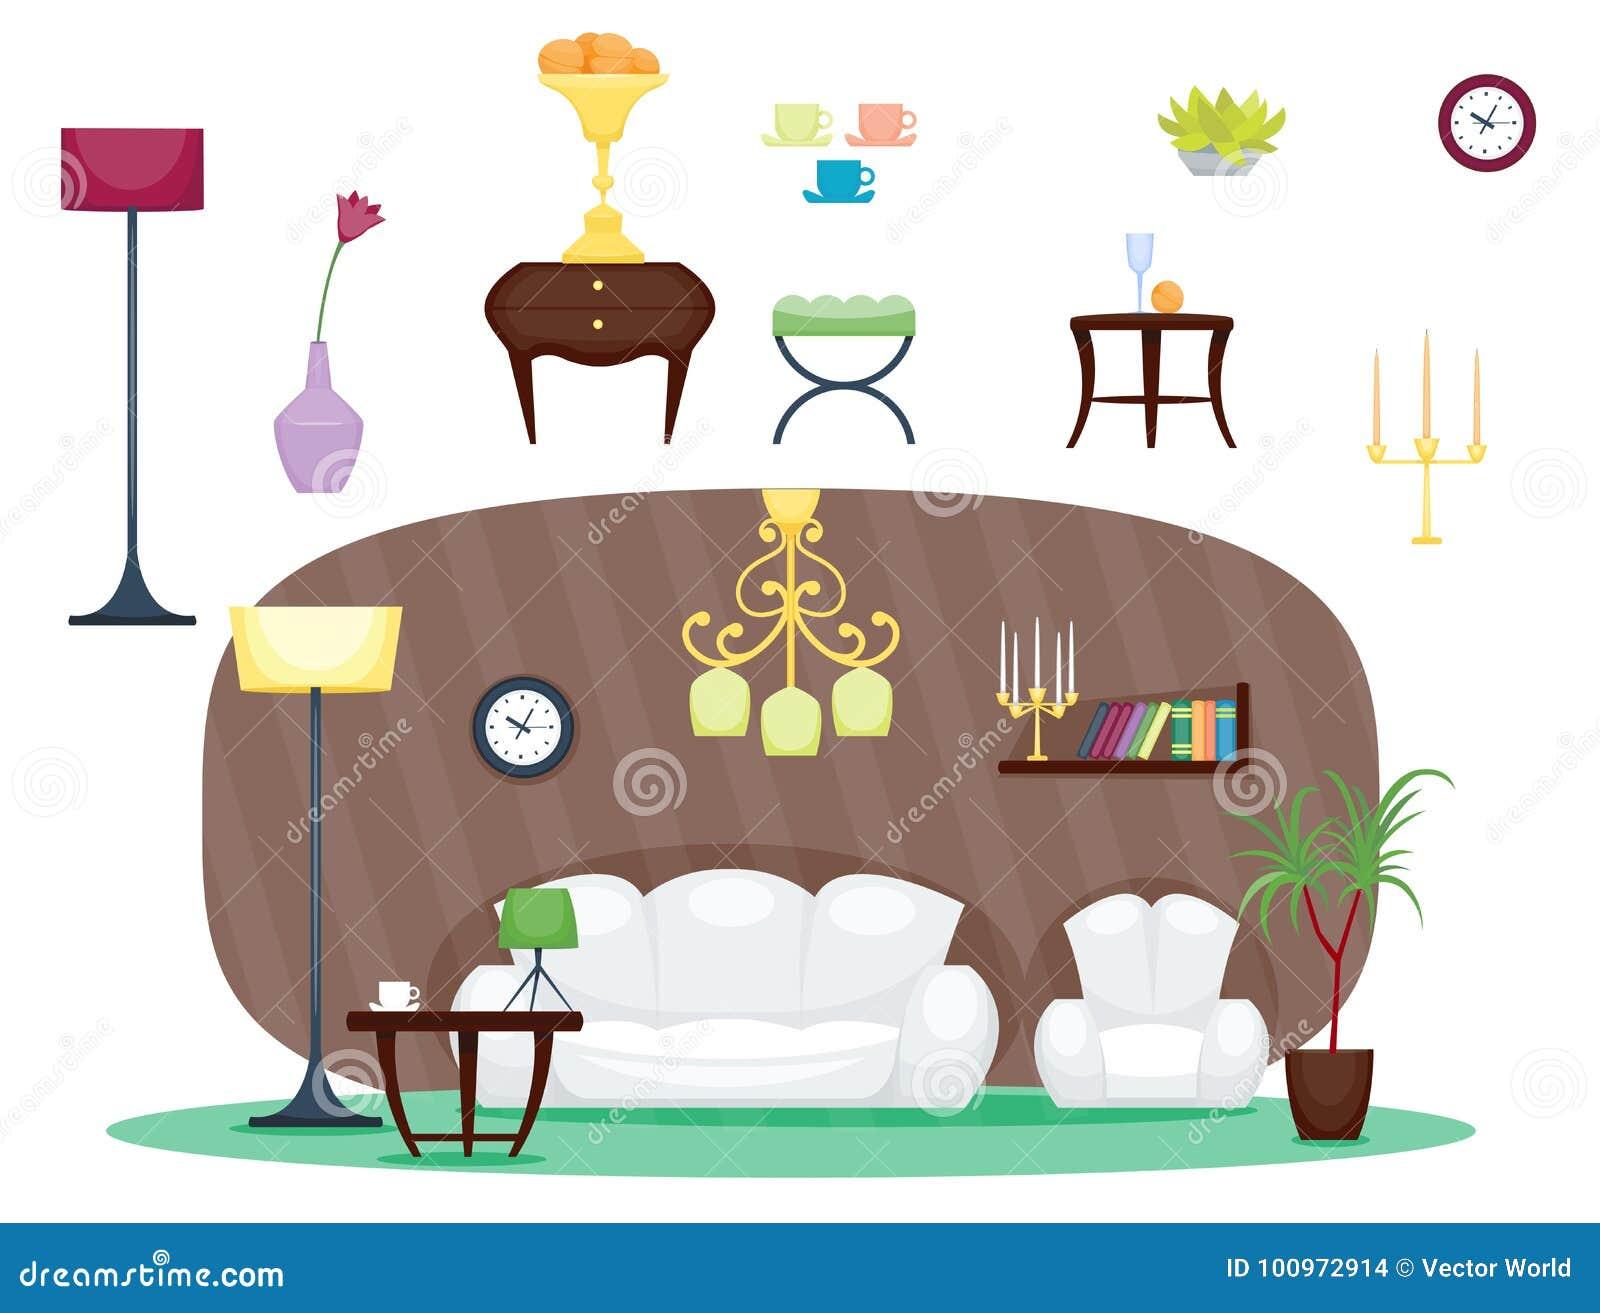 Set Interior Design House Rooms Furniture Stock Vector: Furniture Room Interior Design Home Decor Concept Icon Set